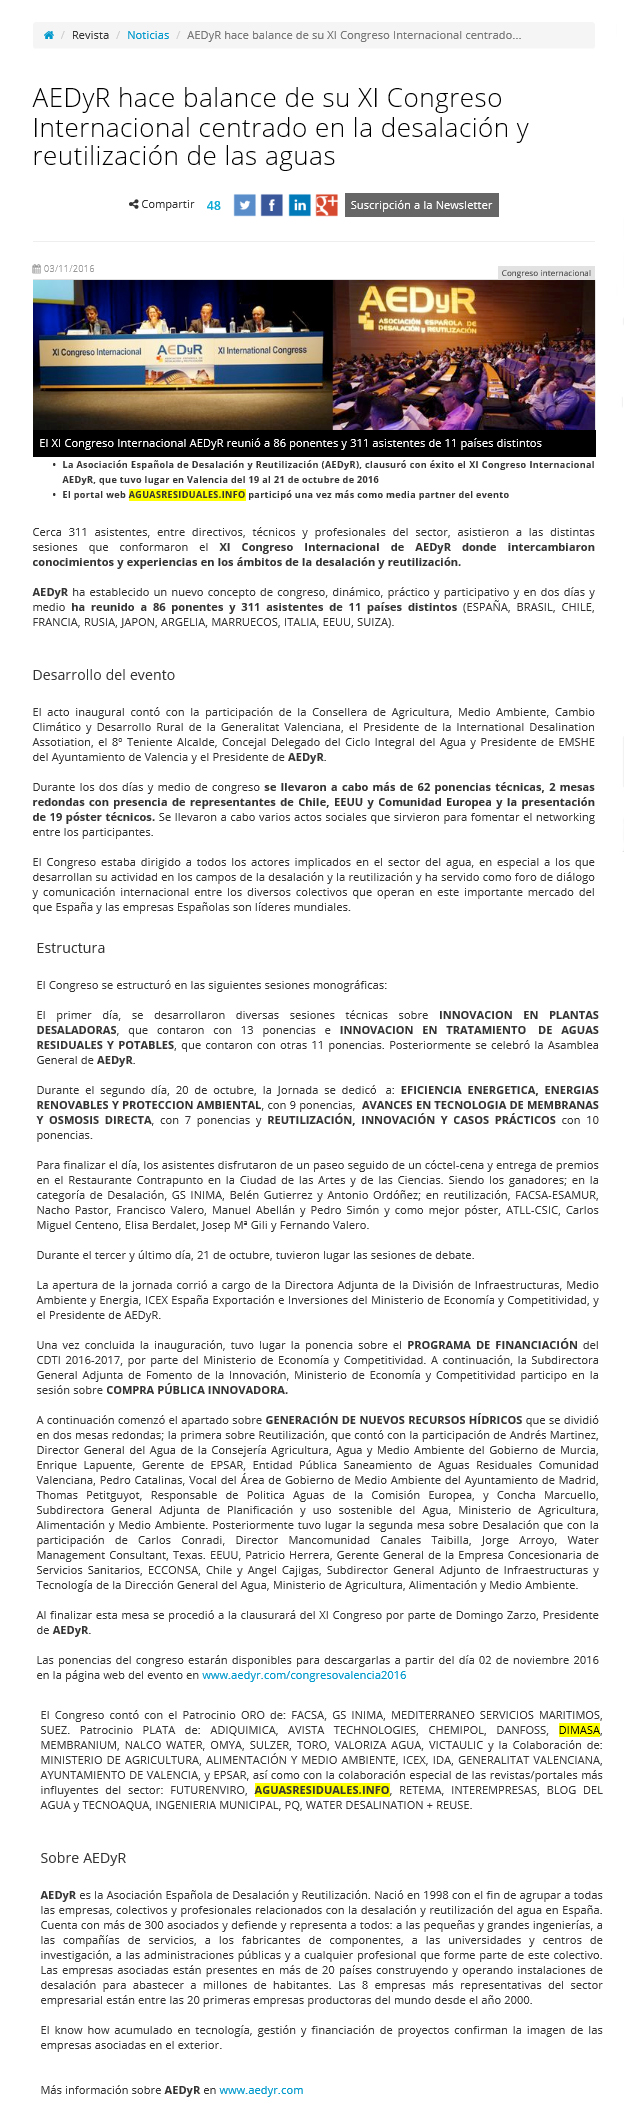 2016-11-03-aguasresiduales-info